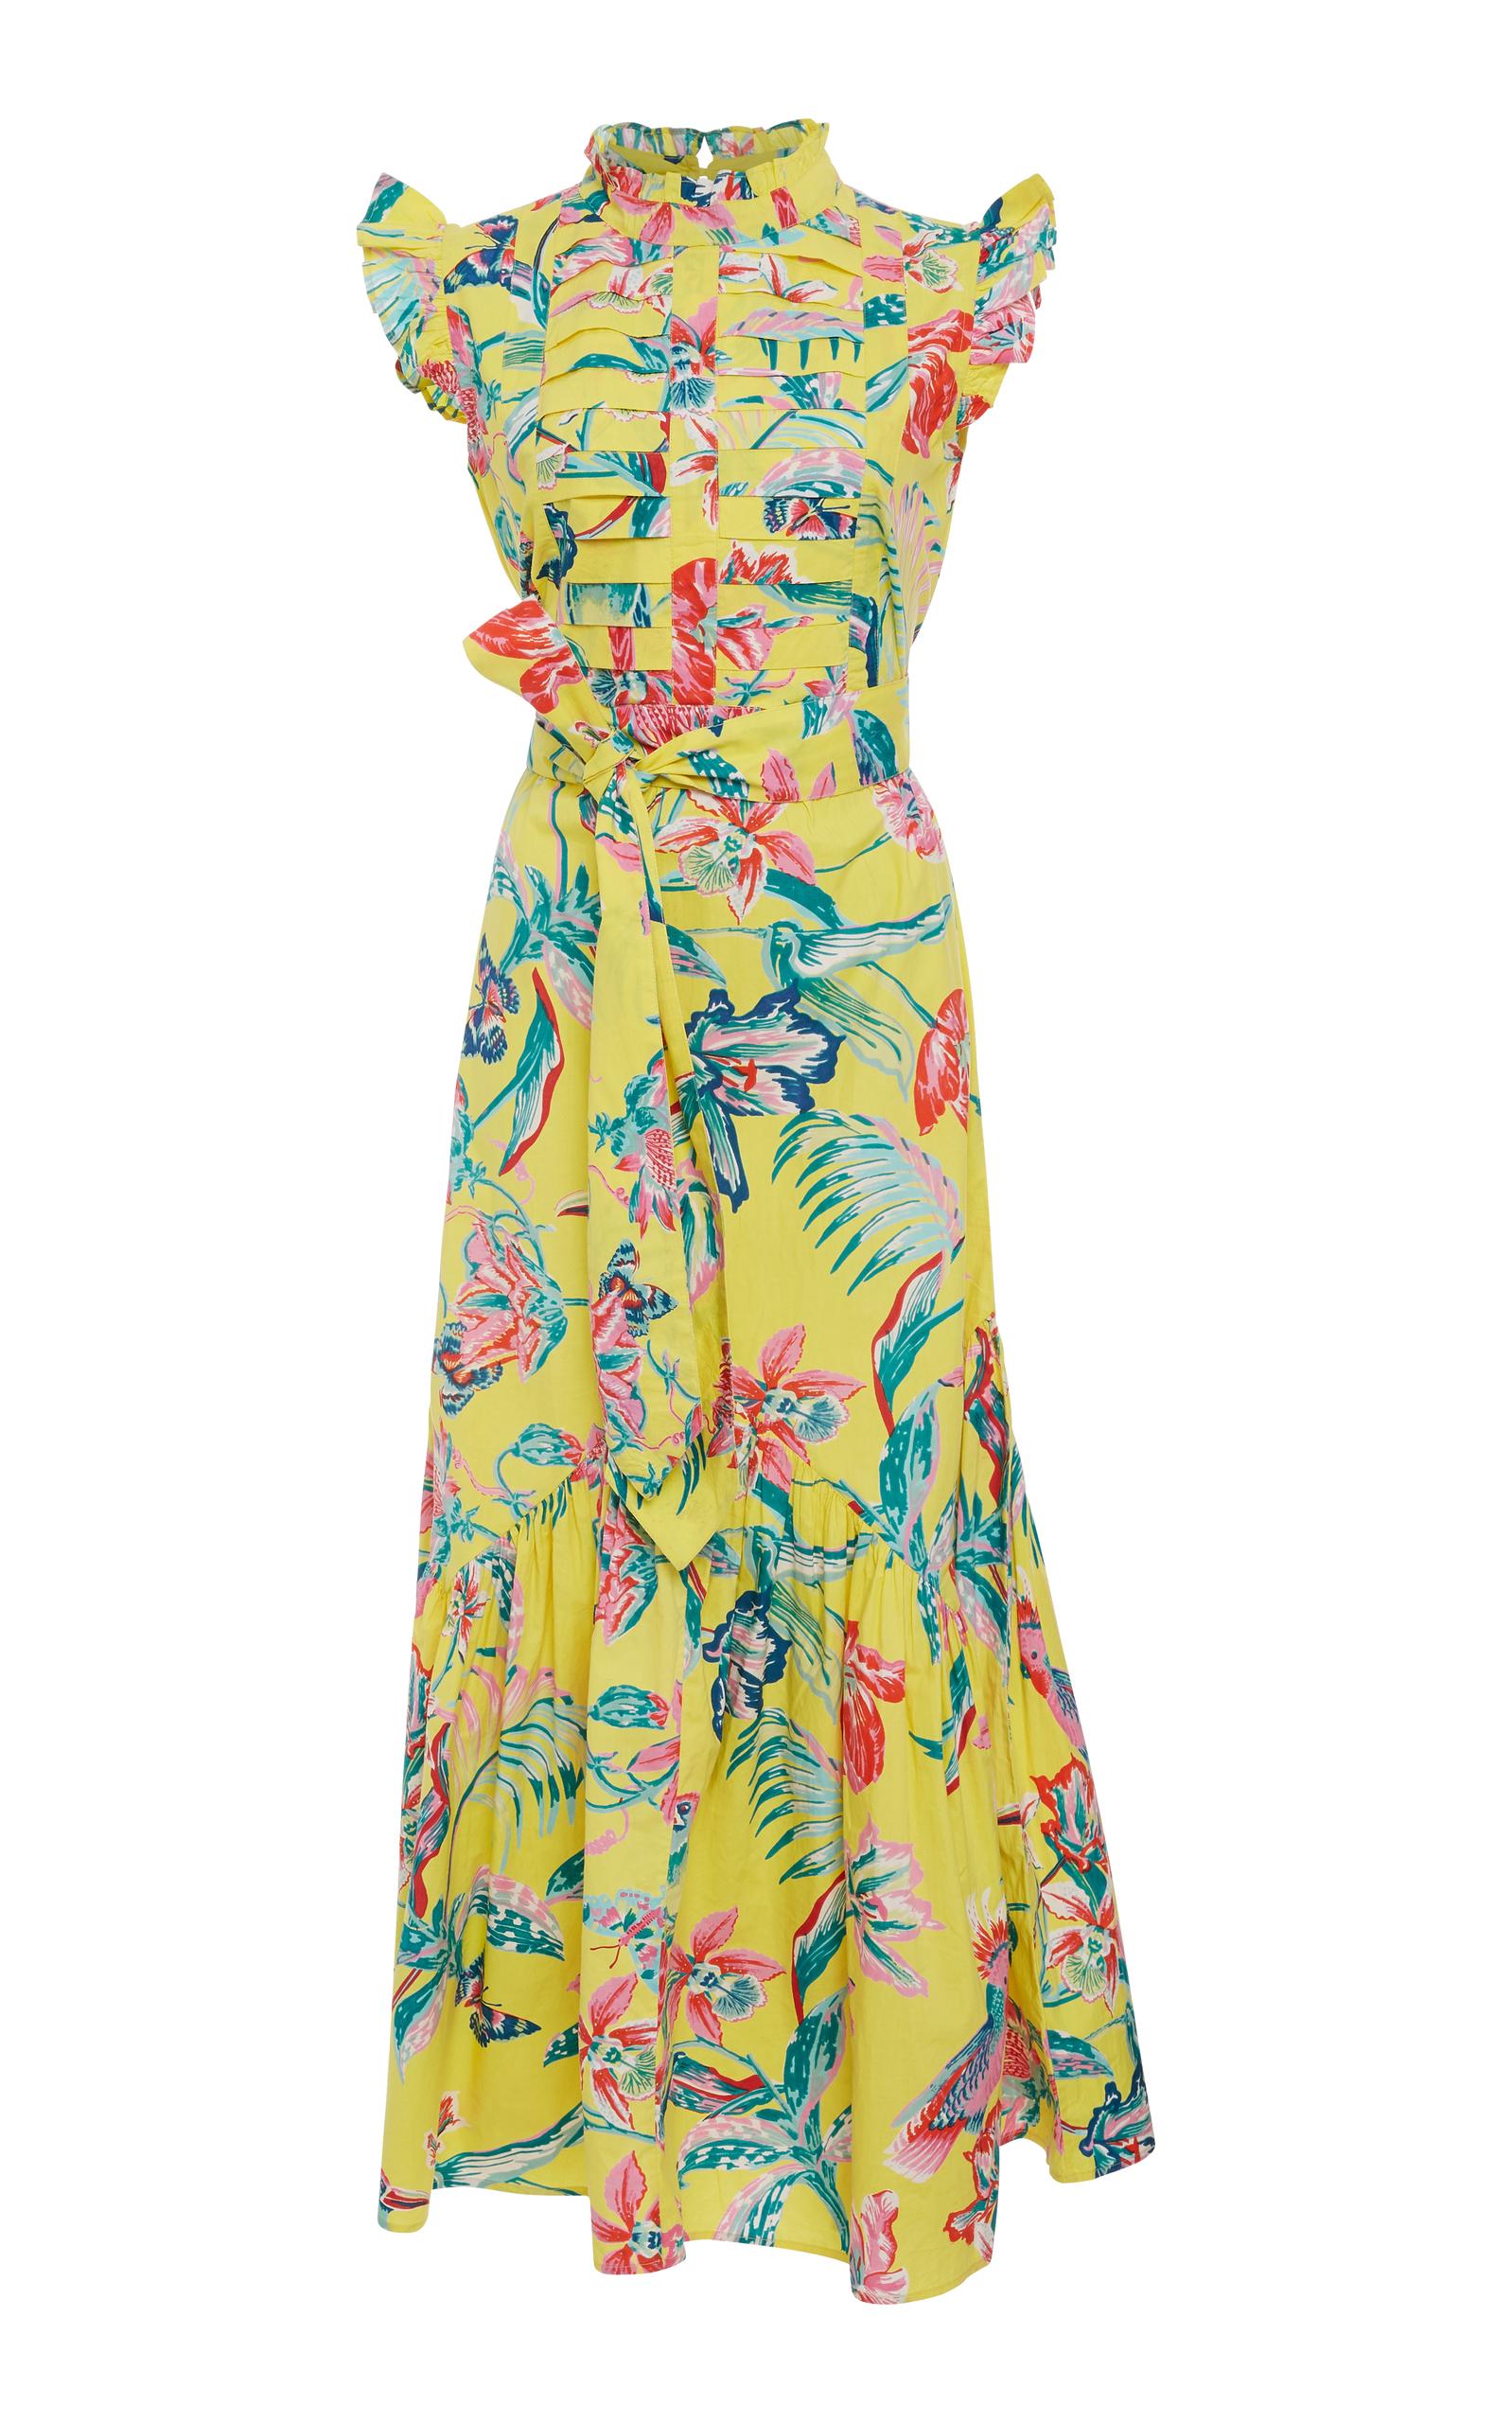 8a91ab6983 Amazon Printed Maxi Dress by Banjanan